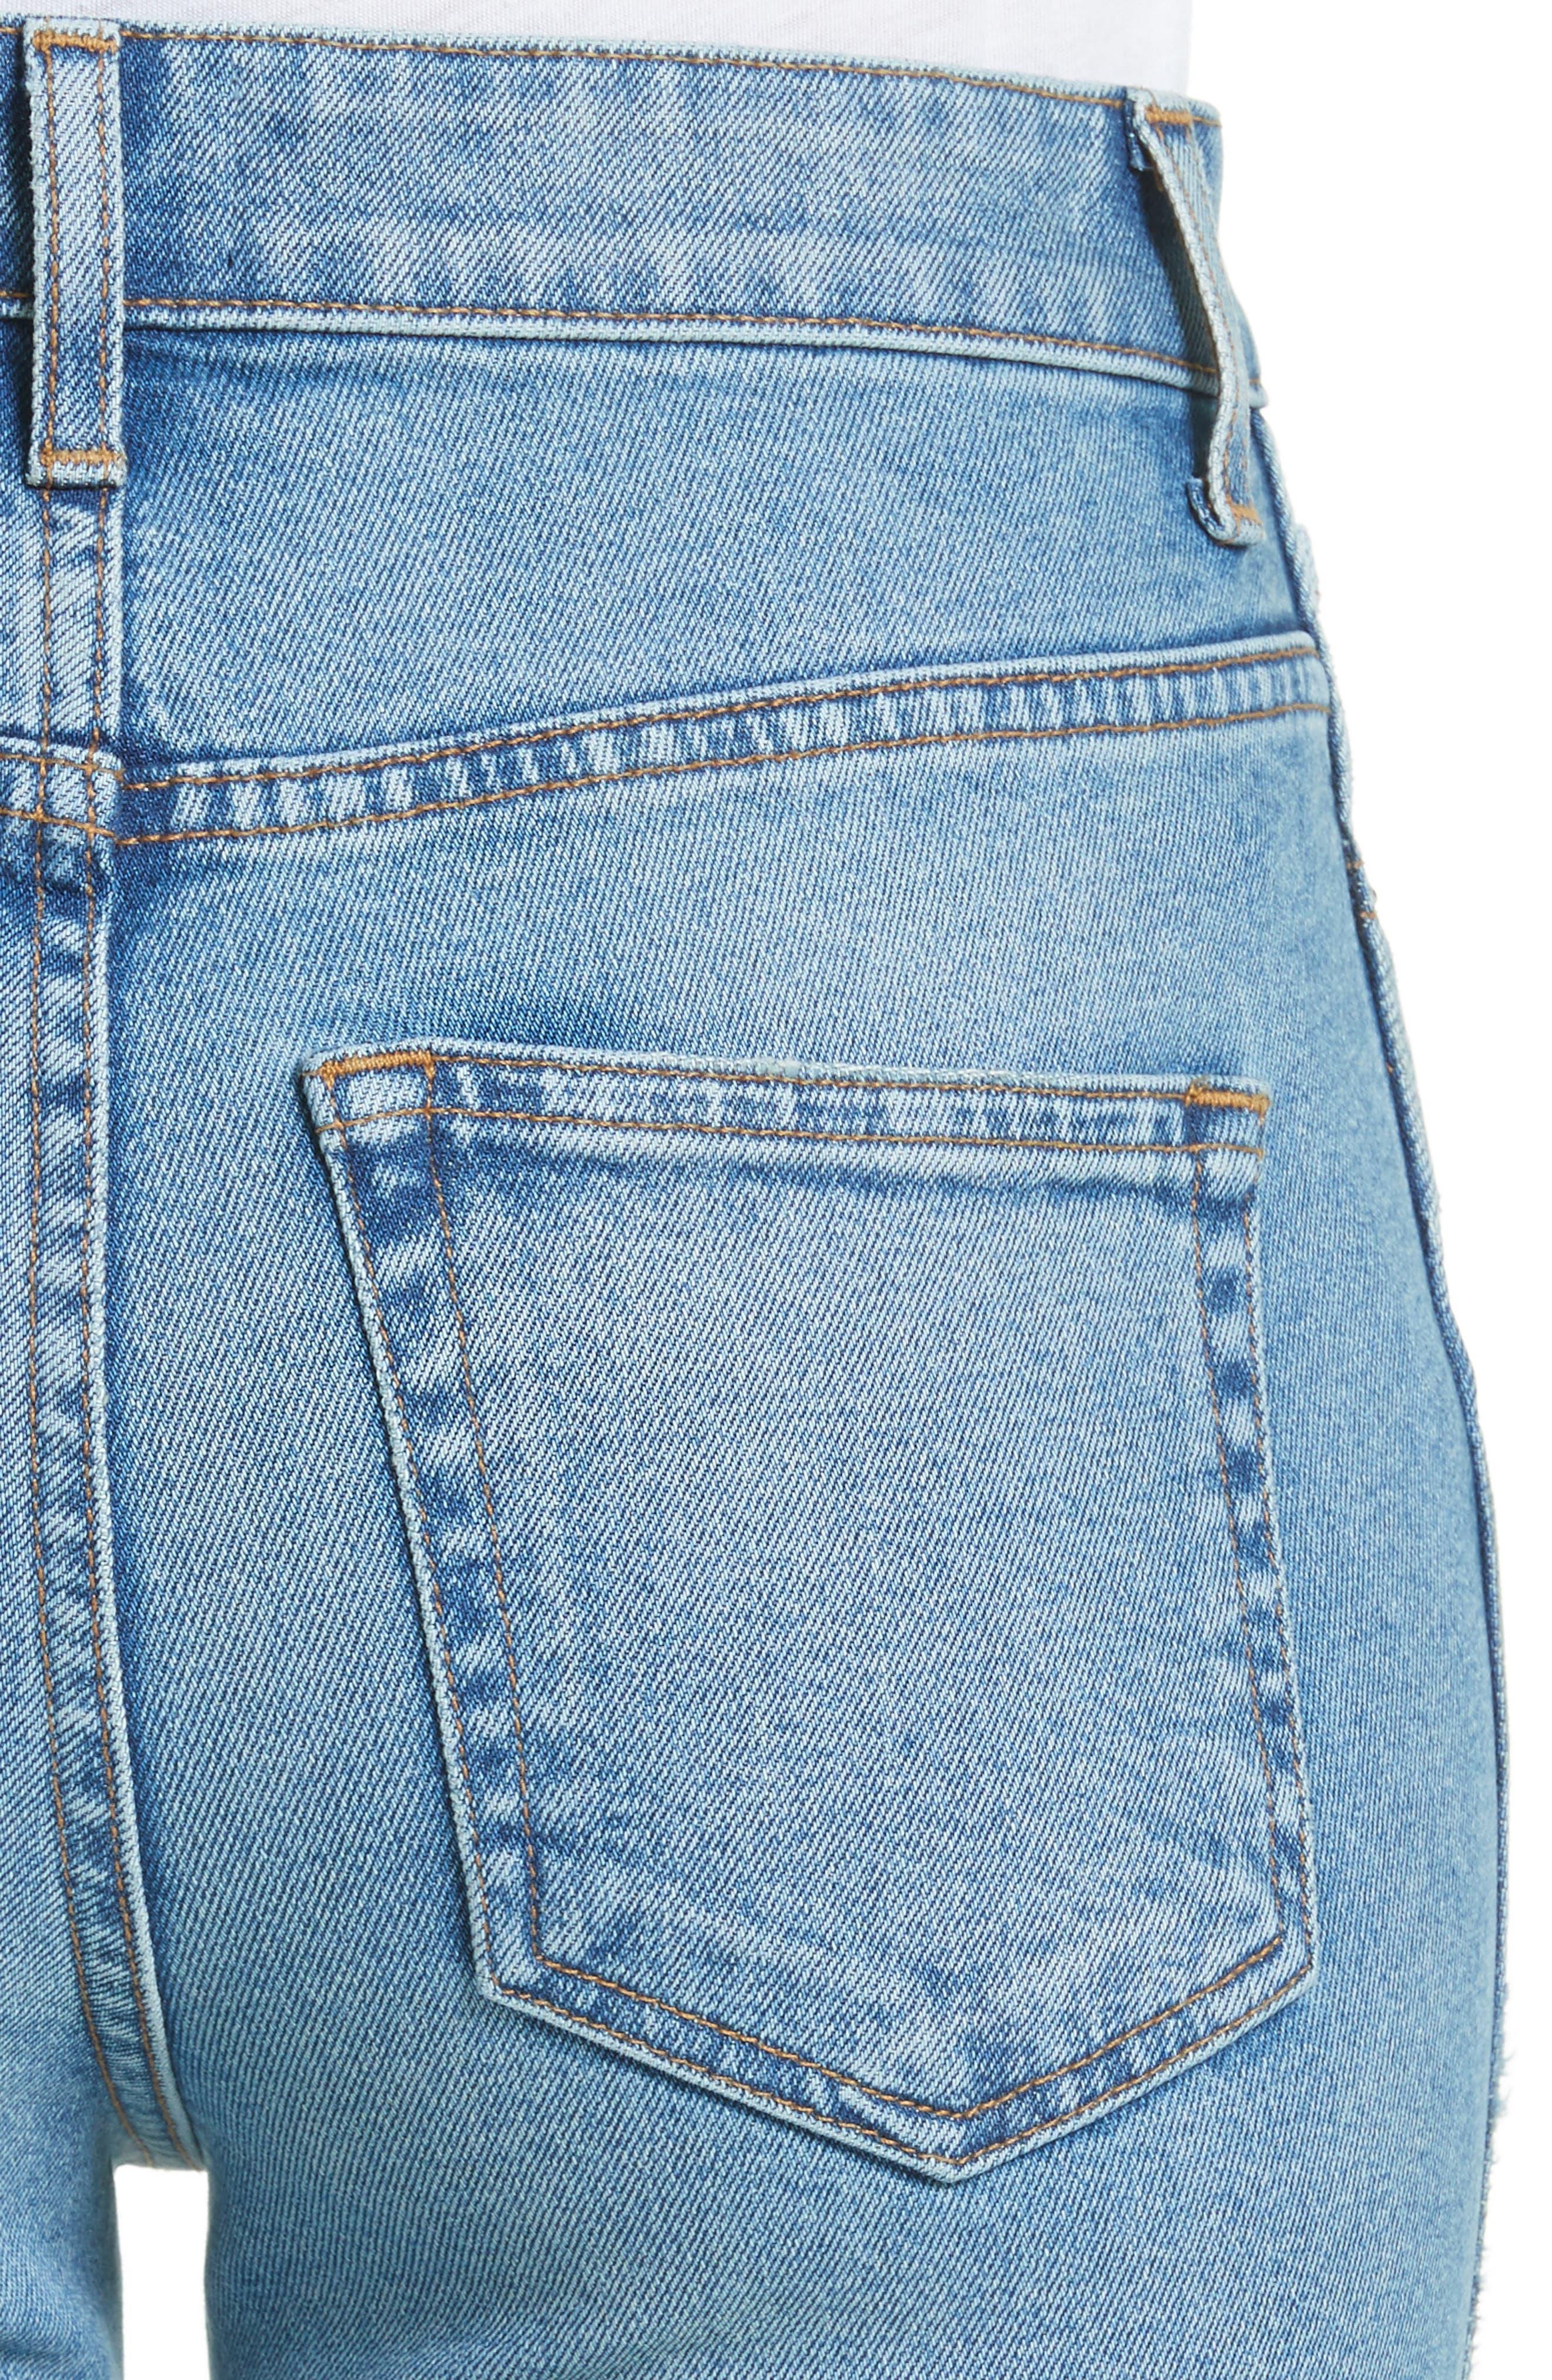 Victoria Straight Leg Jeans,                             Alternate thumbnail 4, color,                             MEDIUM CREASE